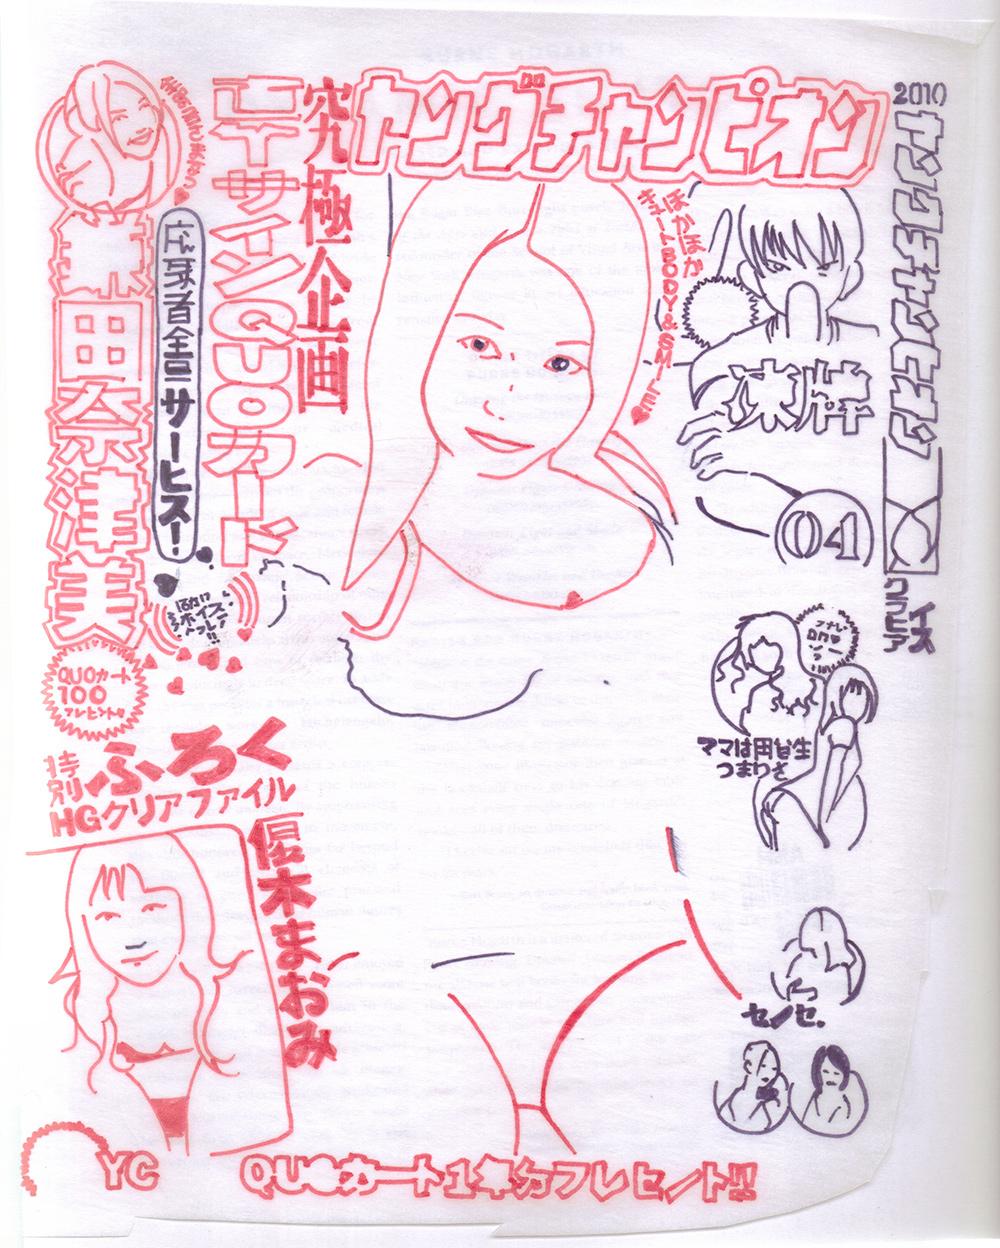 ORIGINAL_DRAWING_TOKYOIDOL.jpg